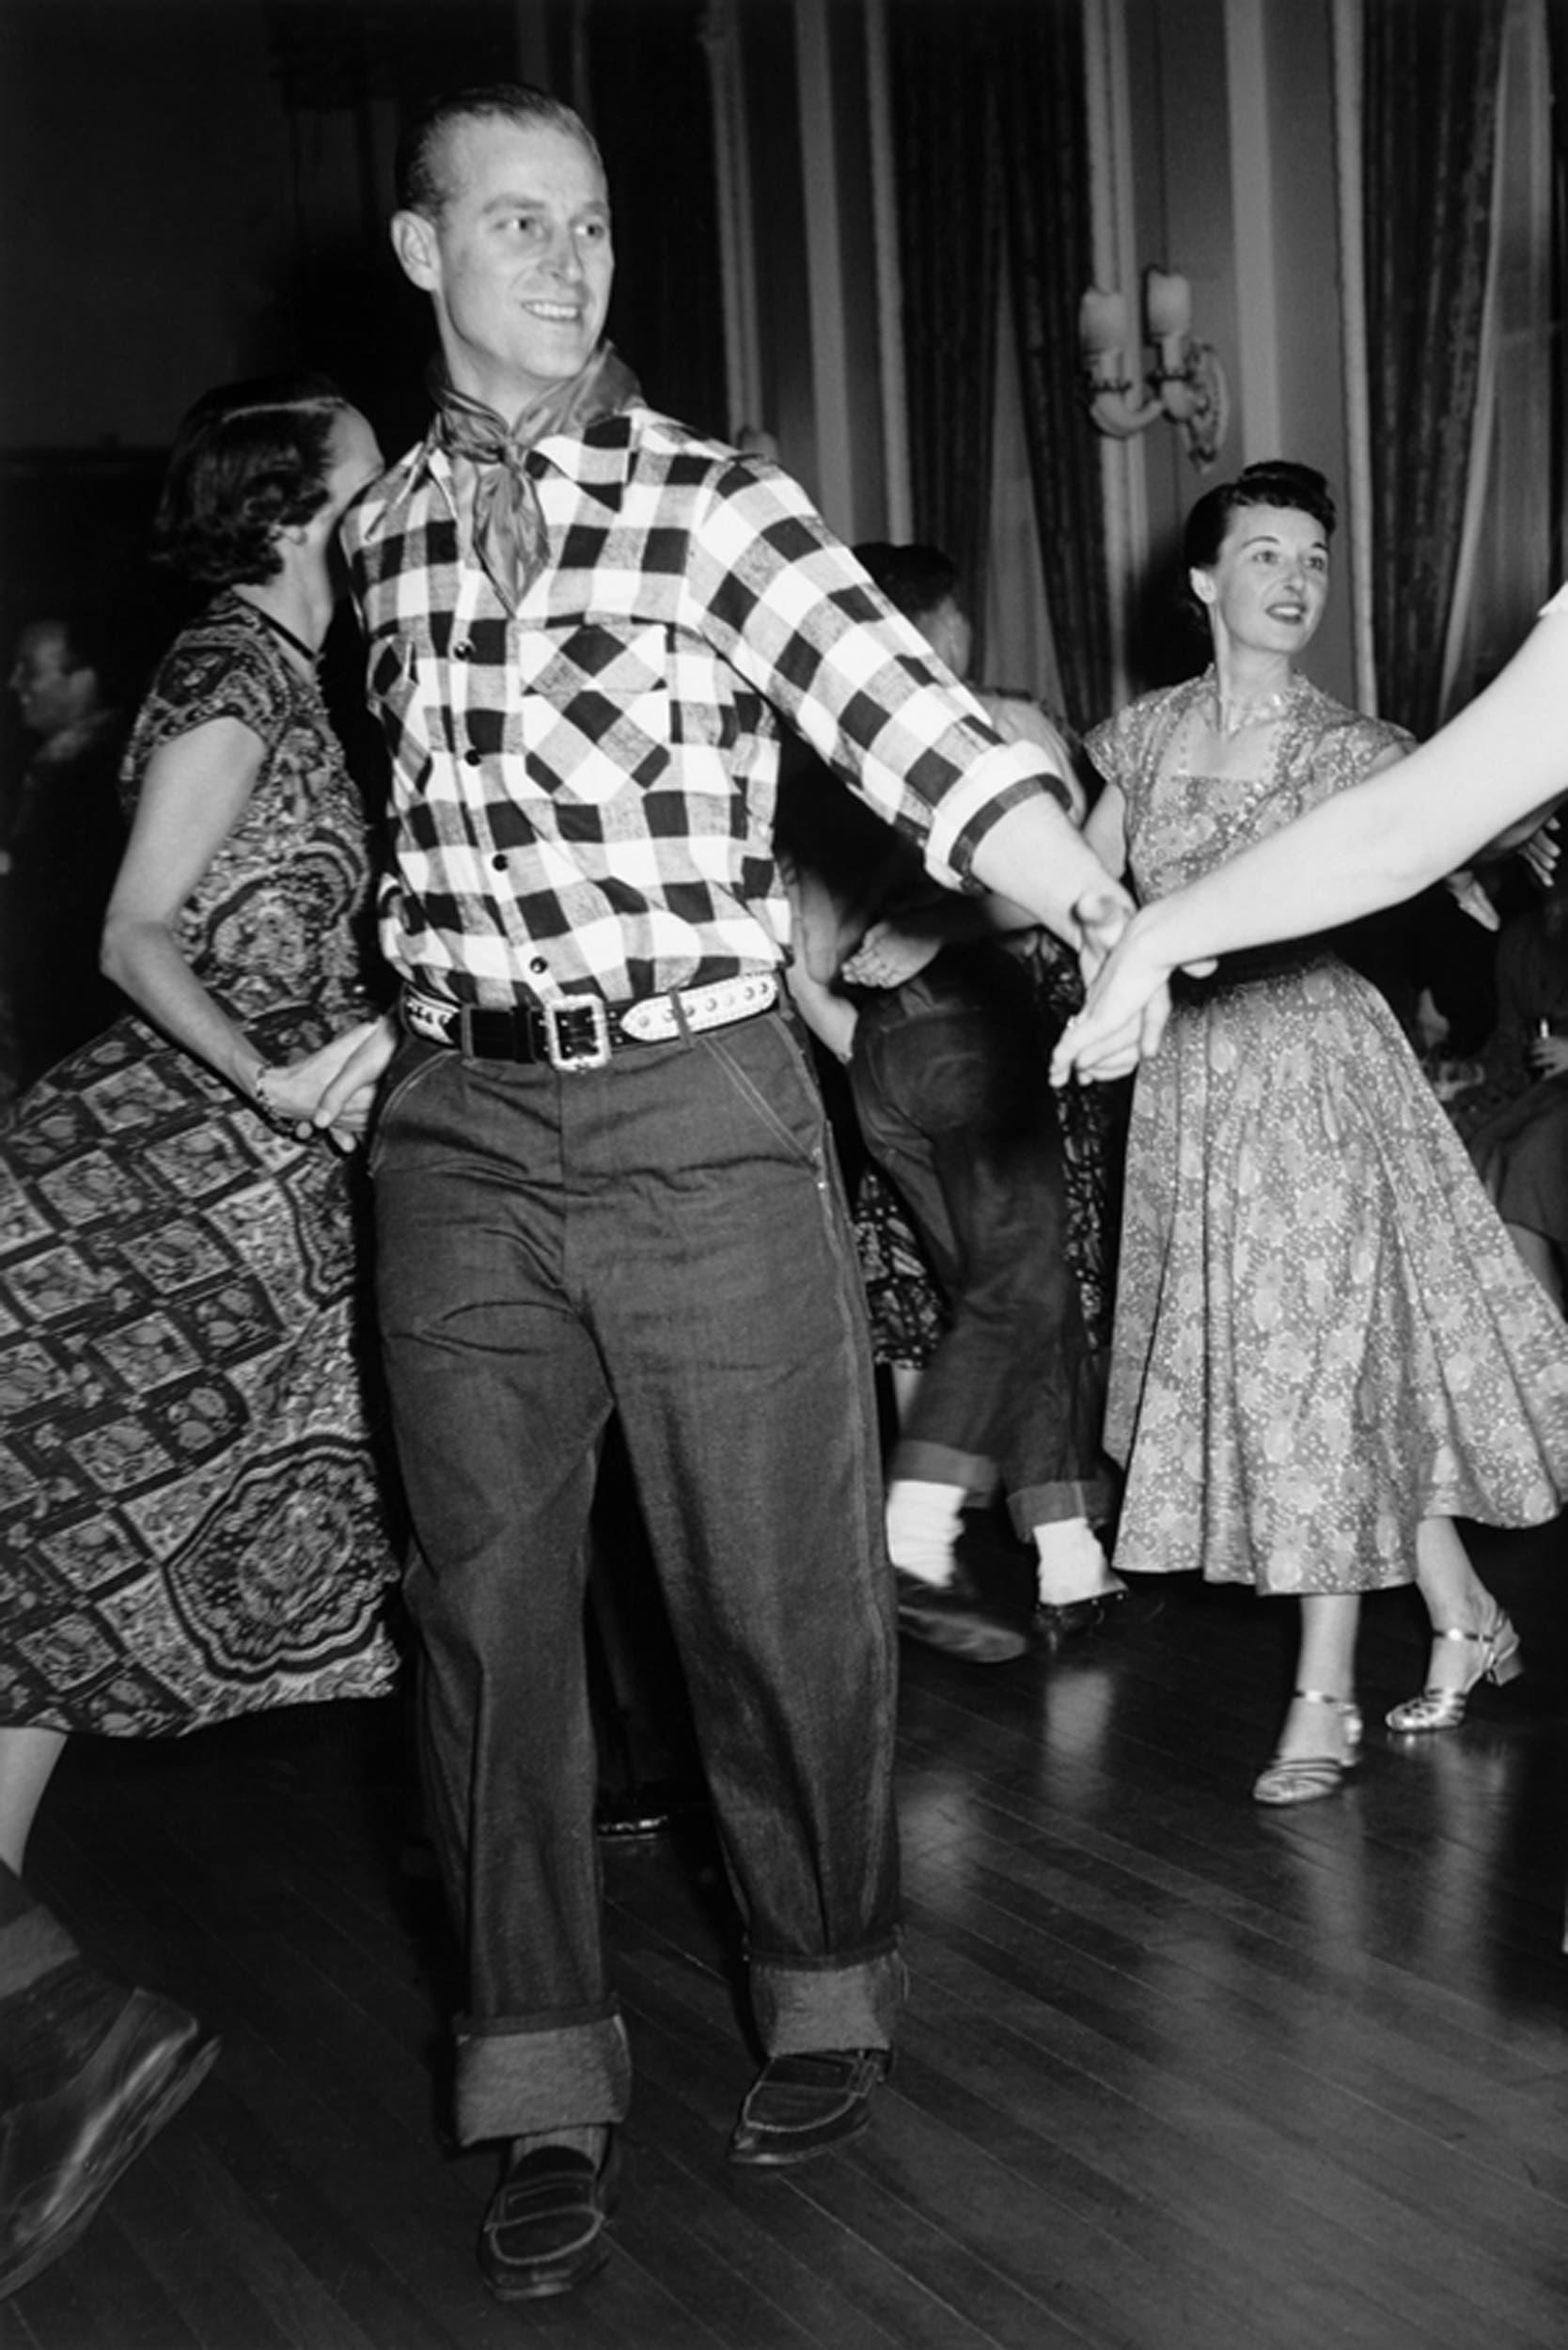 Prince Philip peering westward in Canada in 1951 (Image: Getty Images)